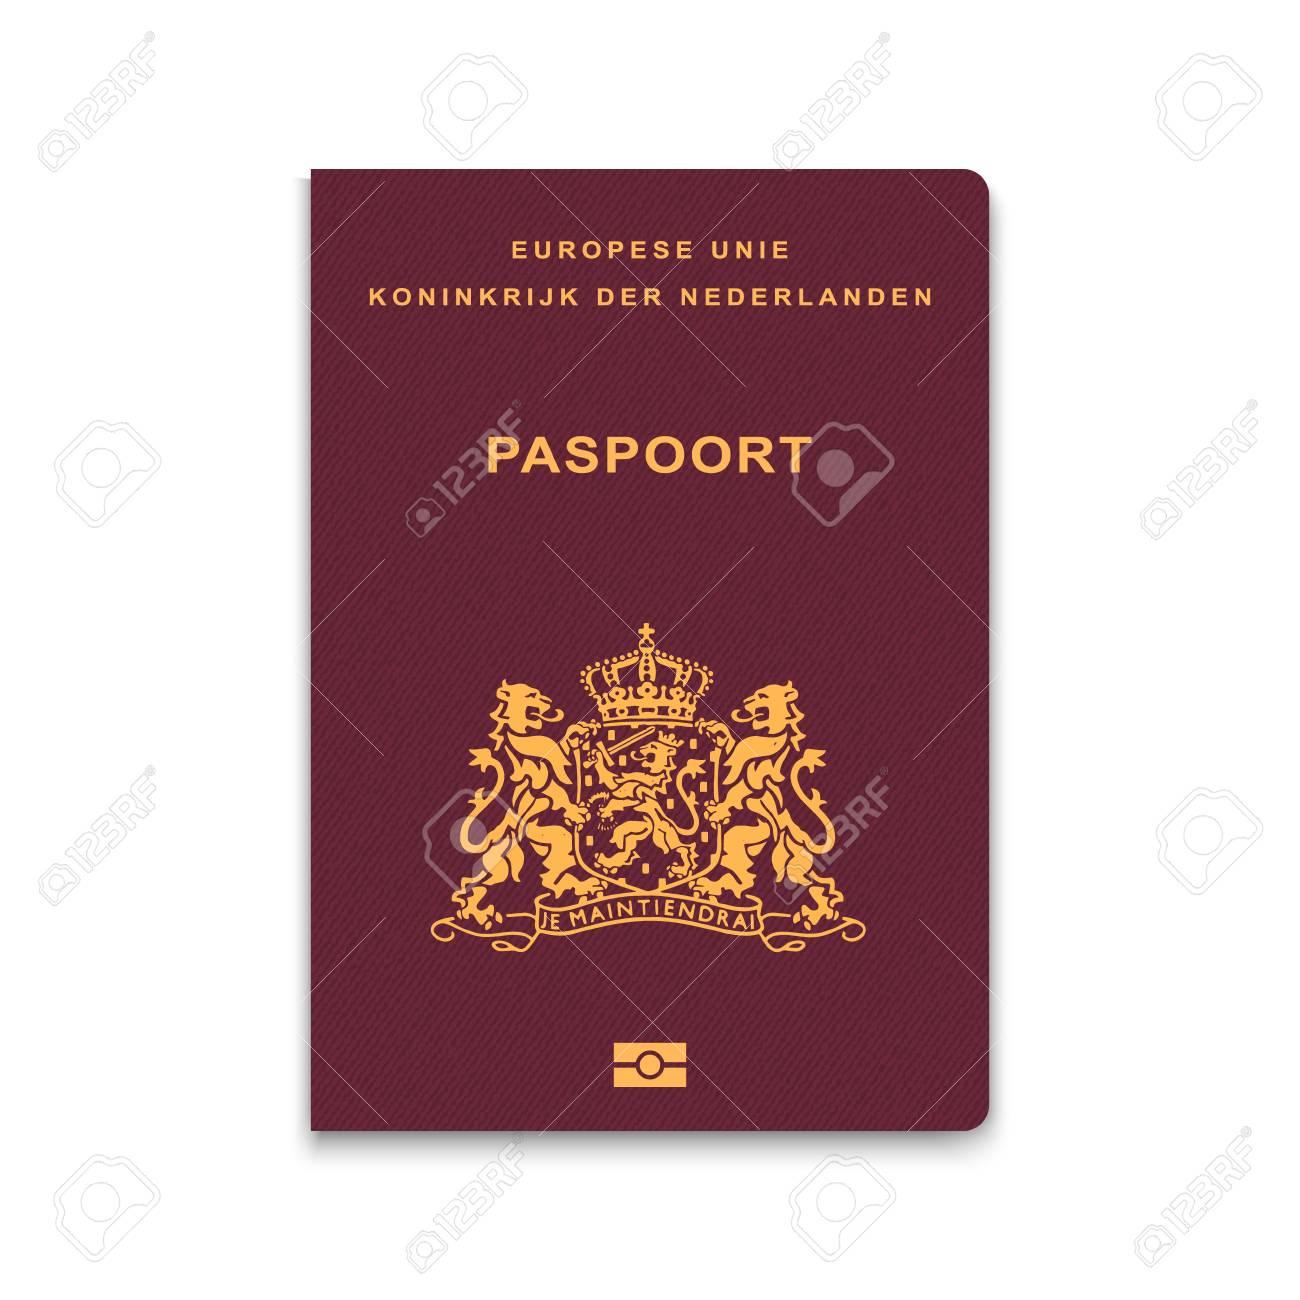 Passport of Netherlands. Vector illustration - 97221737